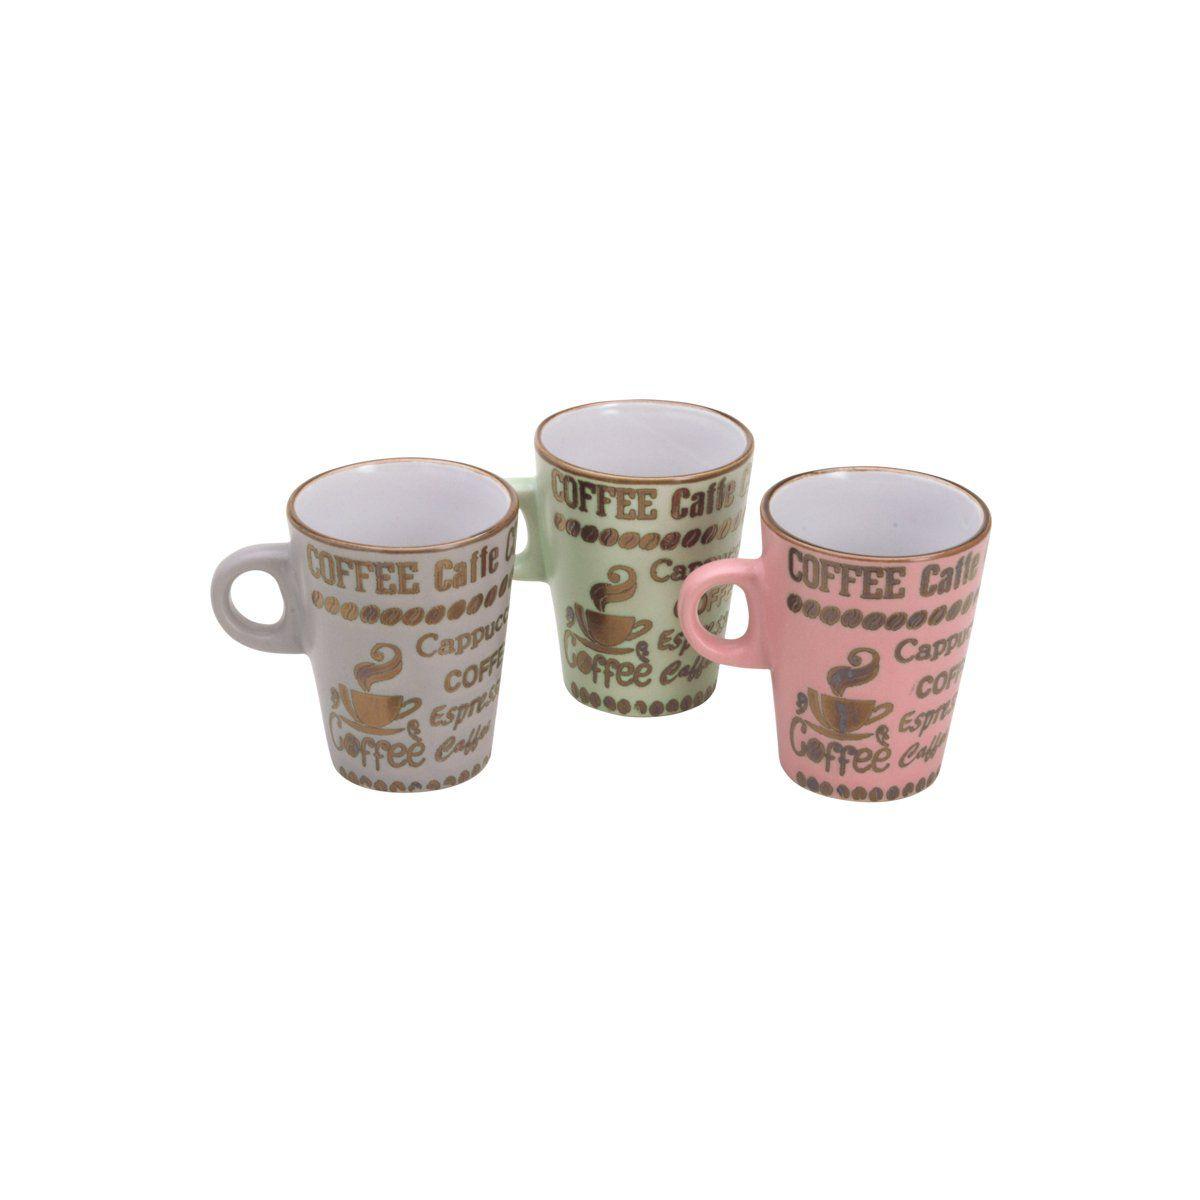 Jogo 6 xícaras 120ml para café de porcelana colorido Parisien Bon Gourmet - 26497